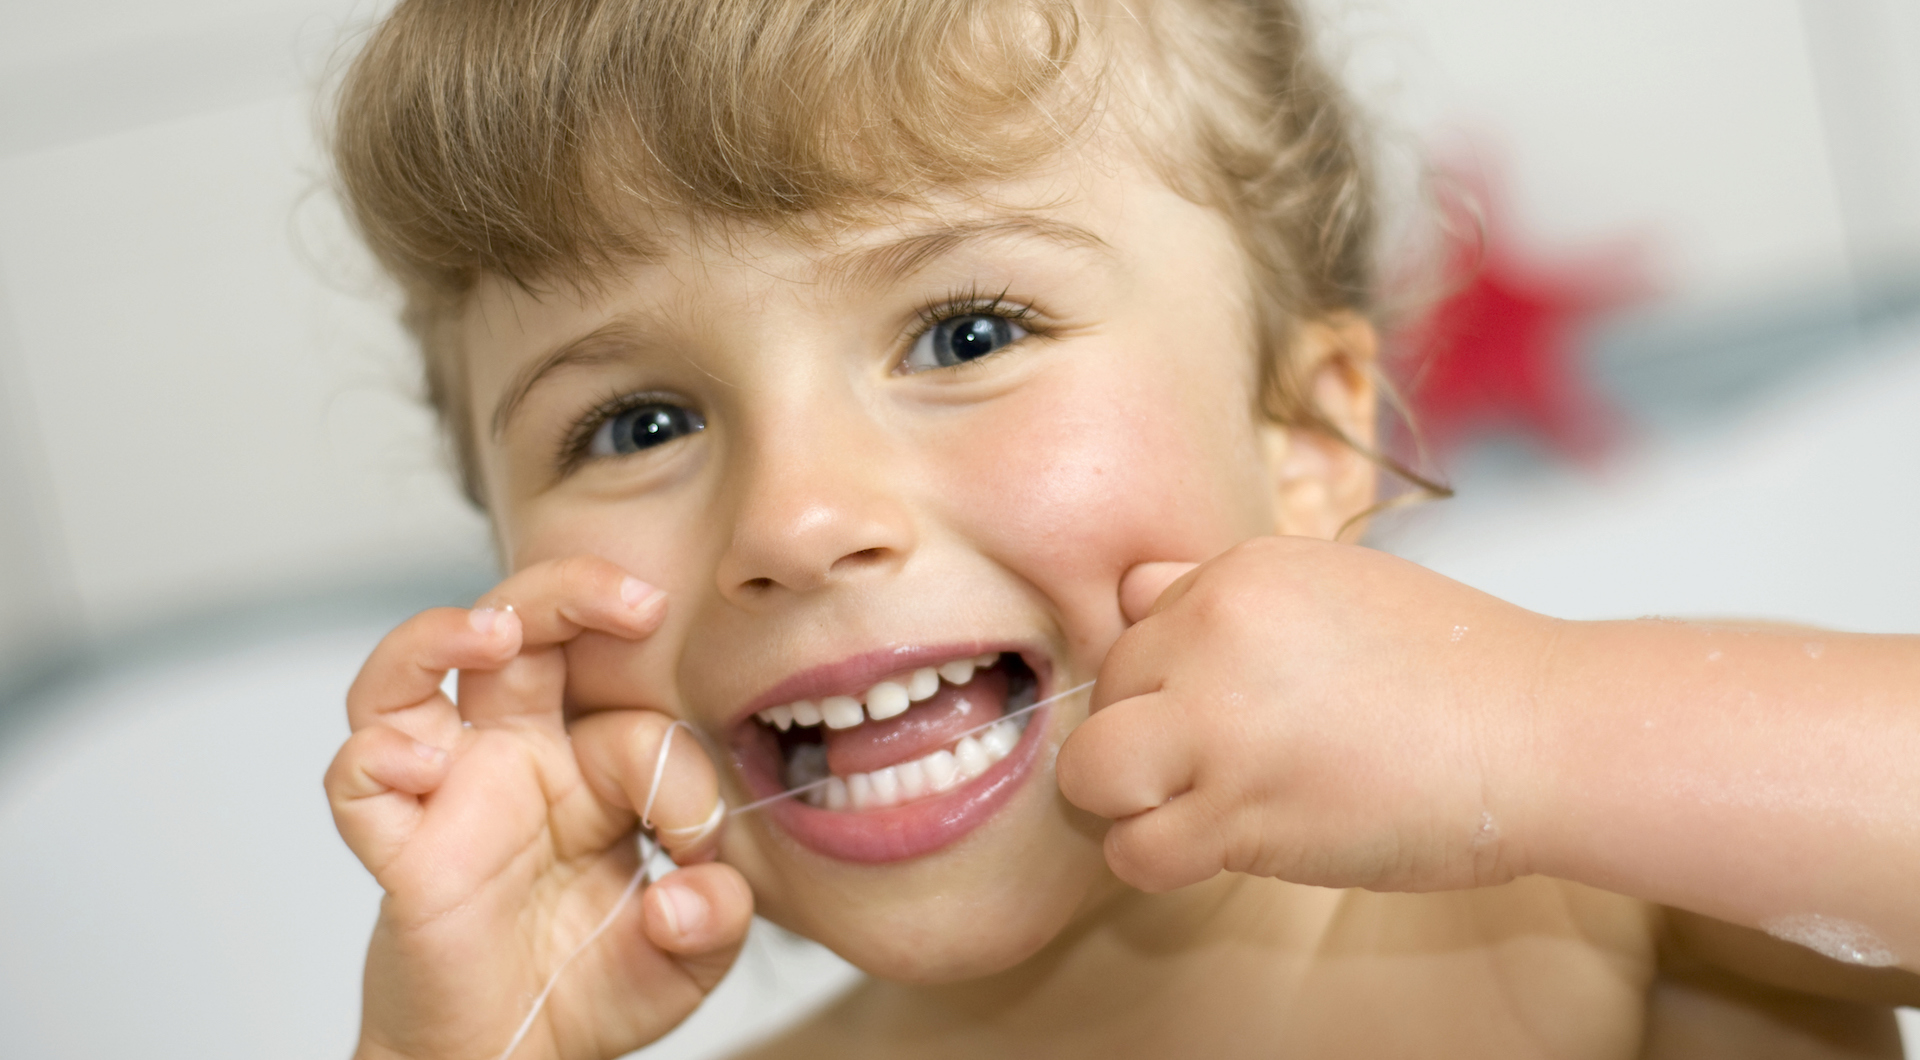 dental health habits start in home